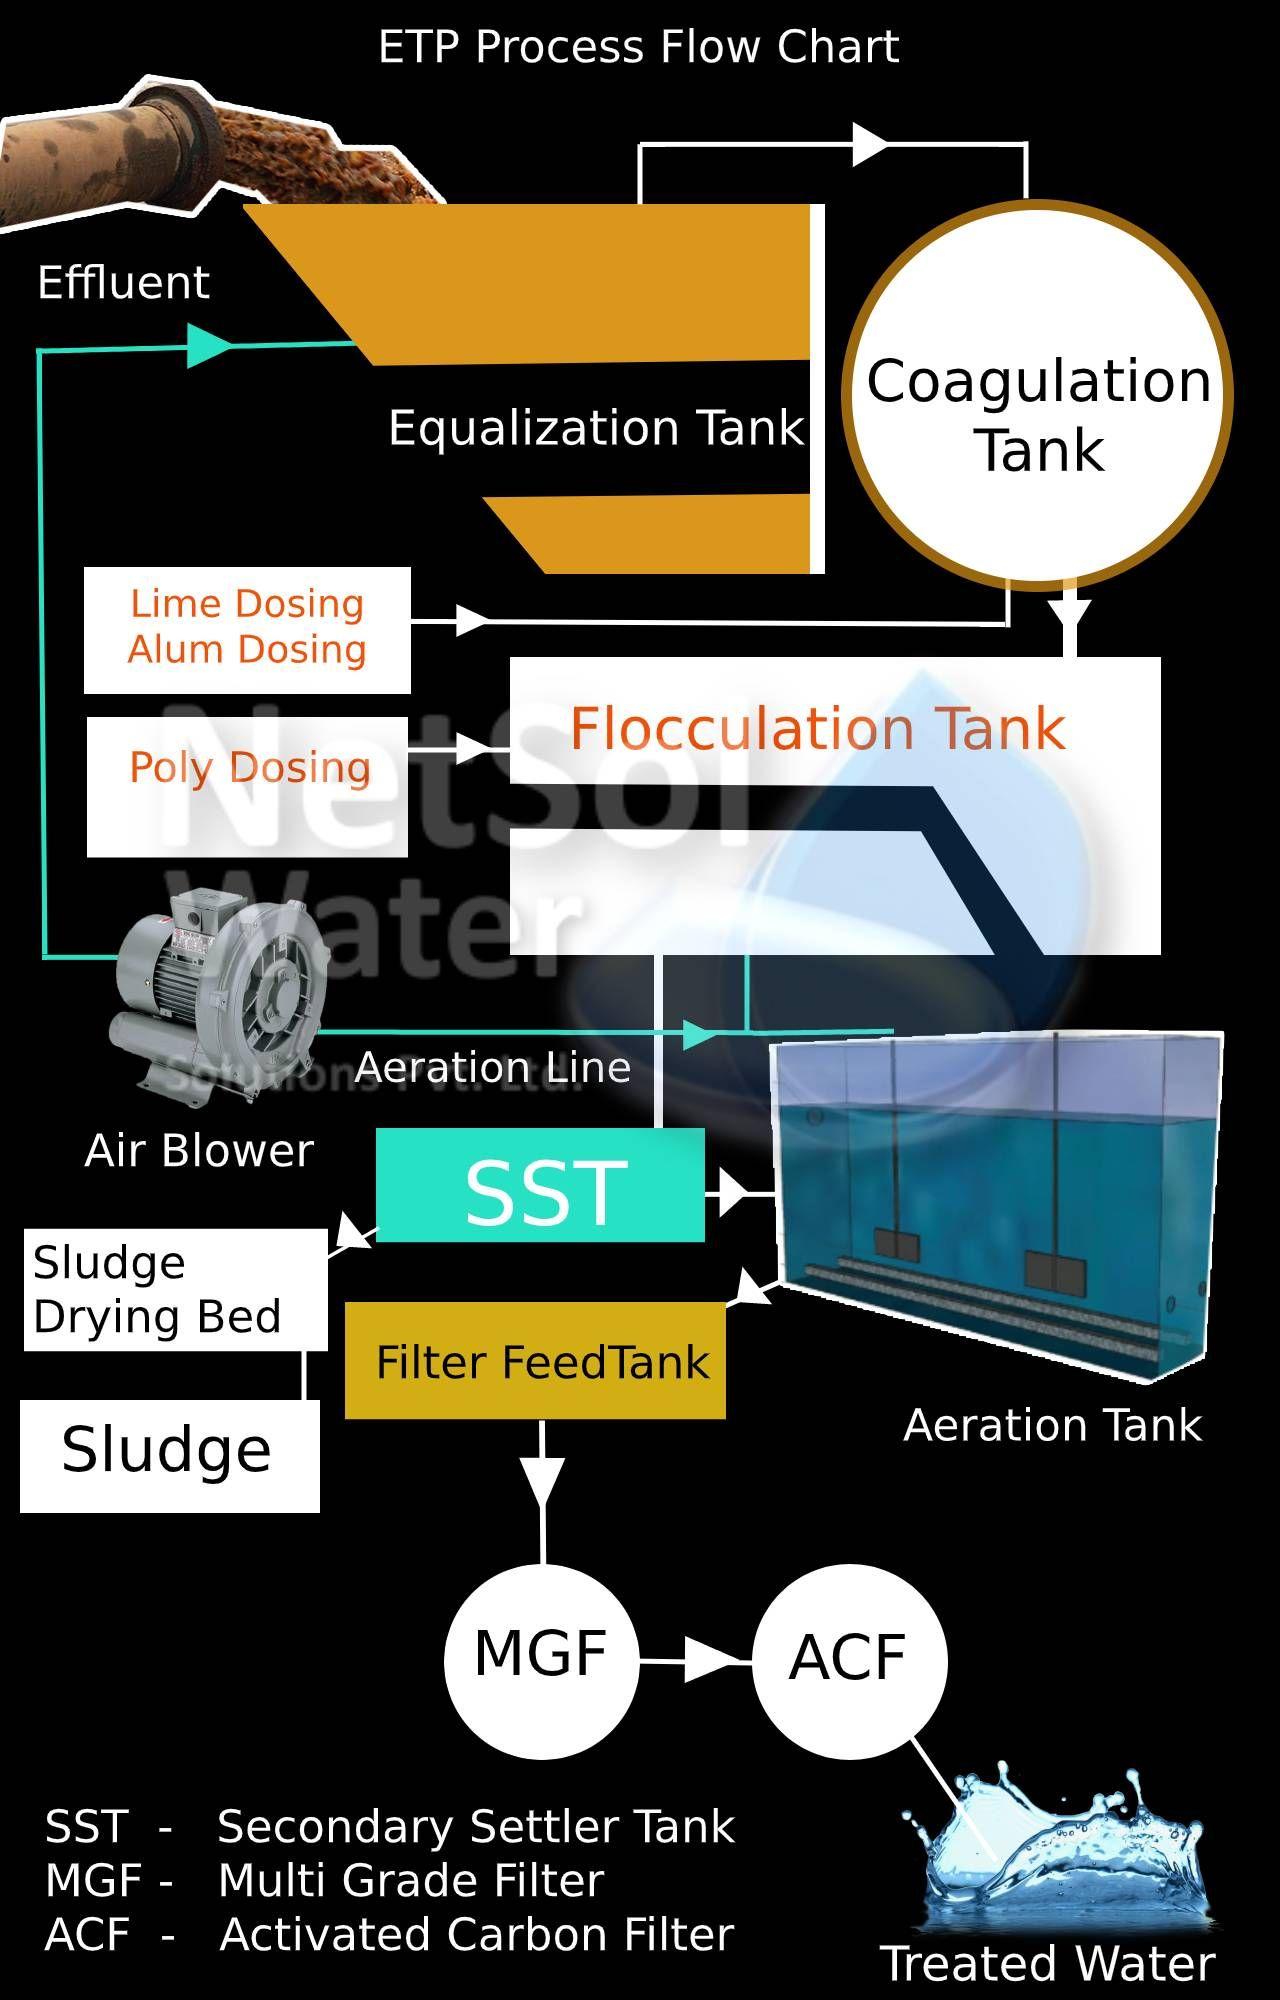 ETP Process Flow Diagram in 2020 Sewage treatment, Water